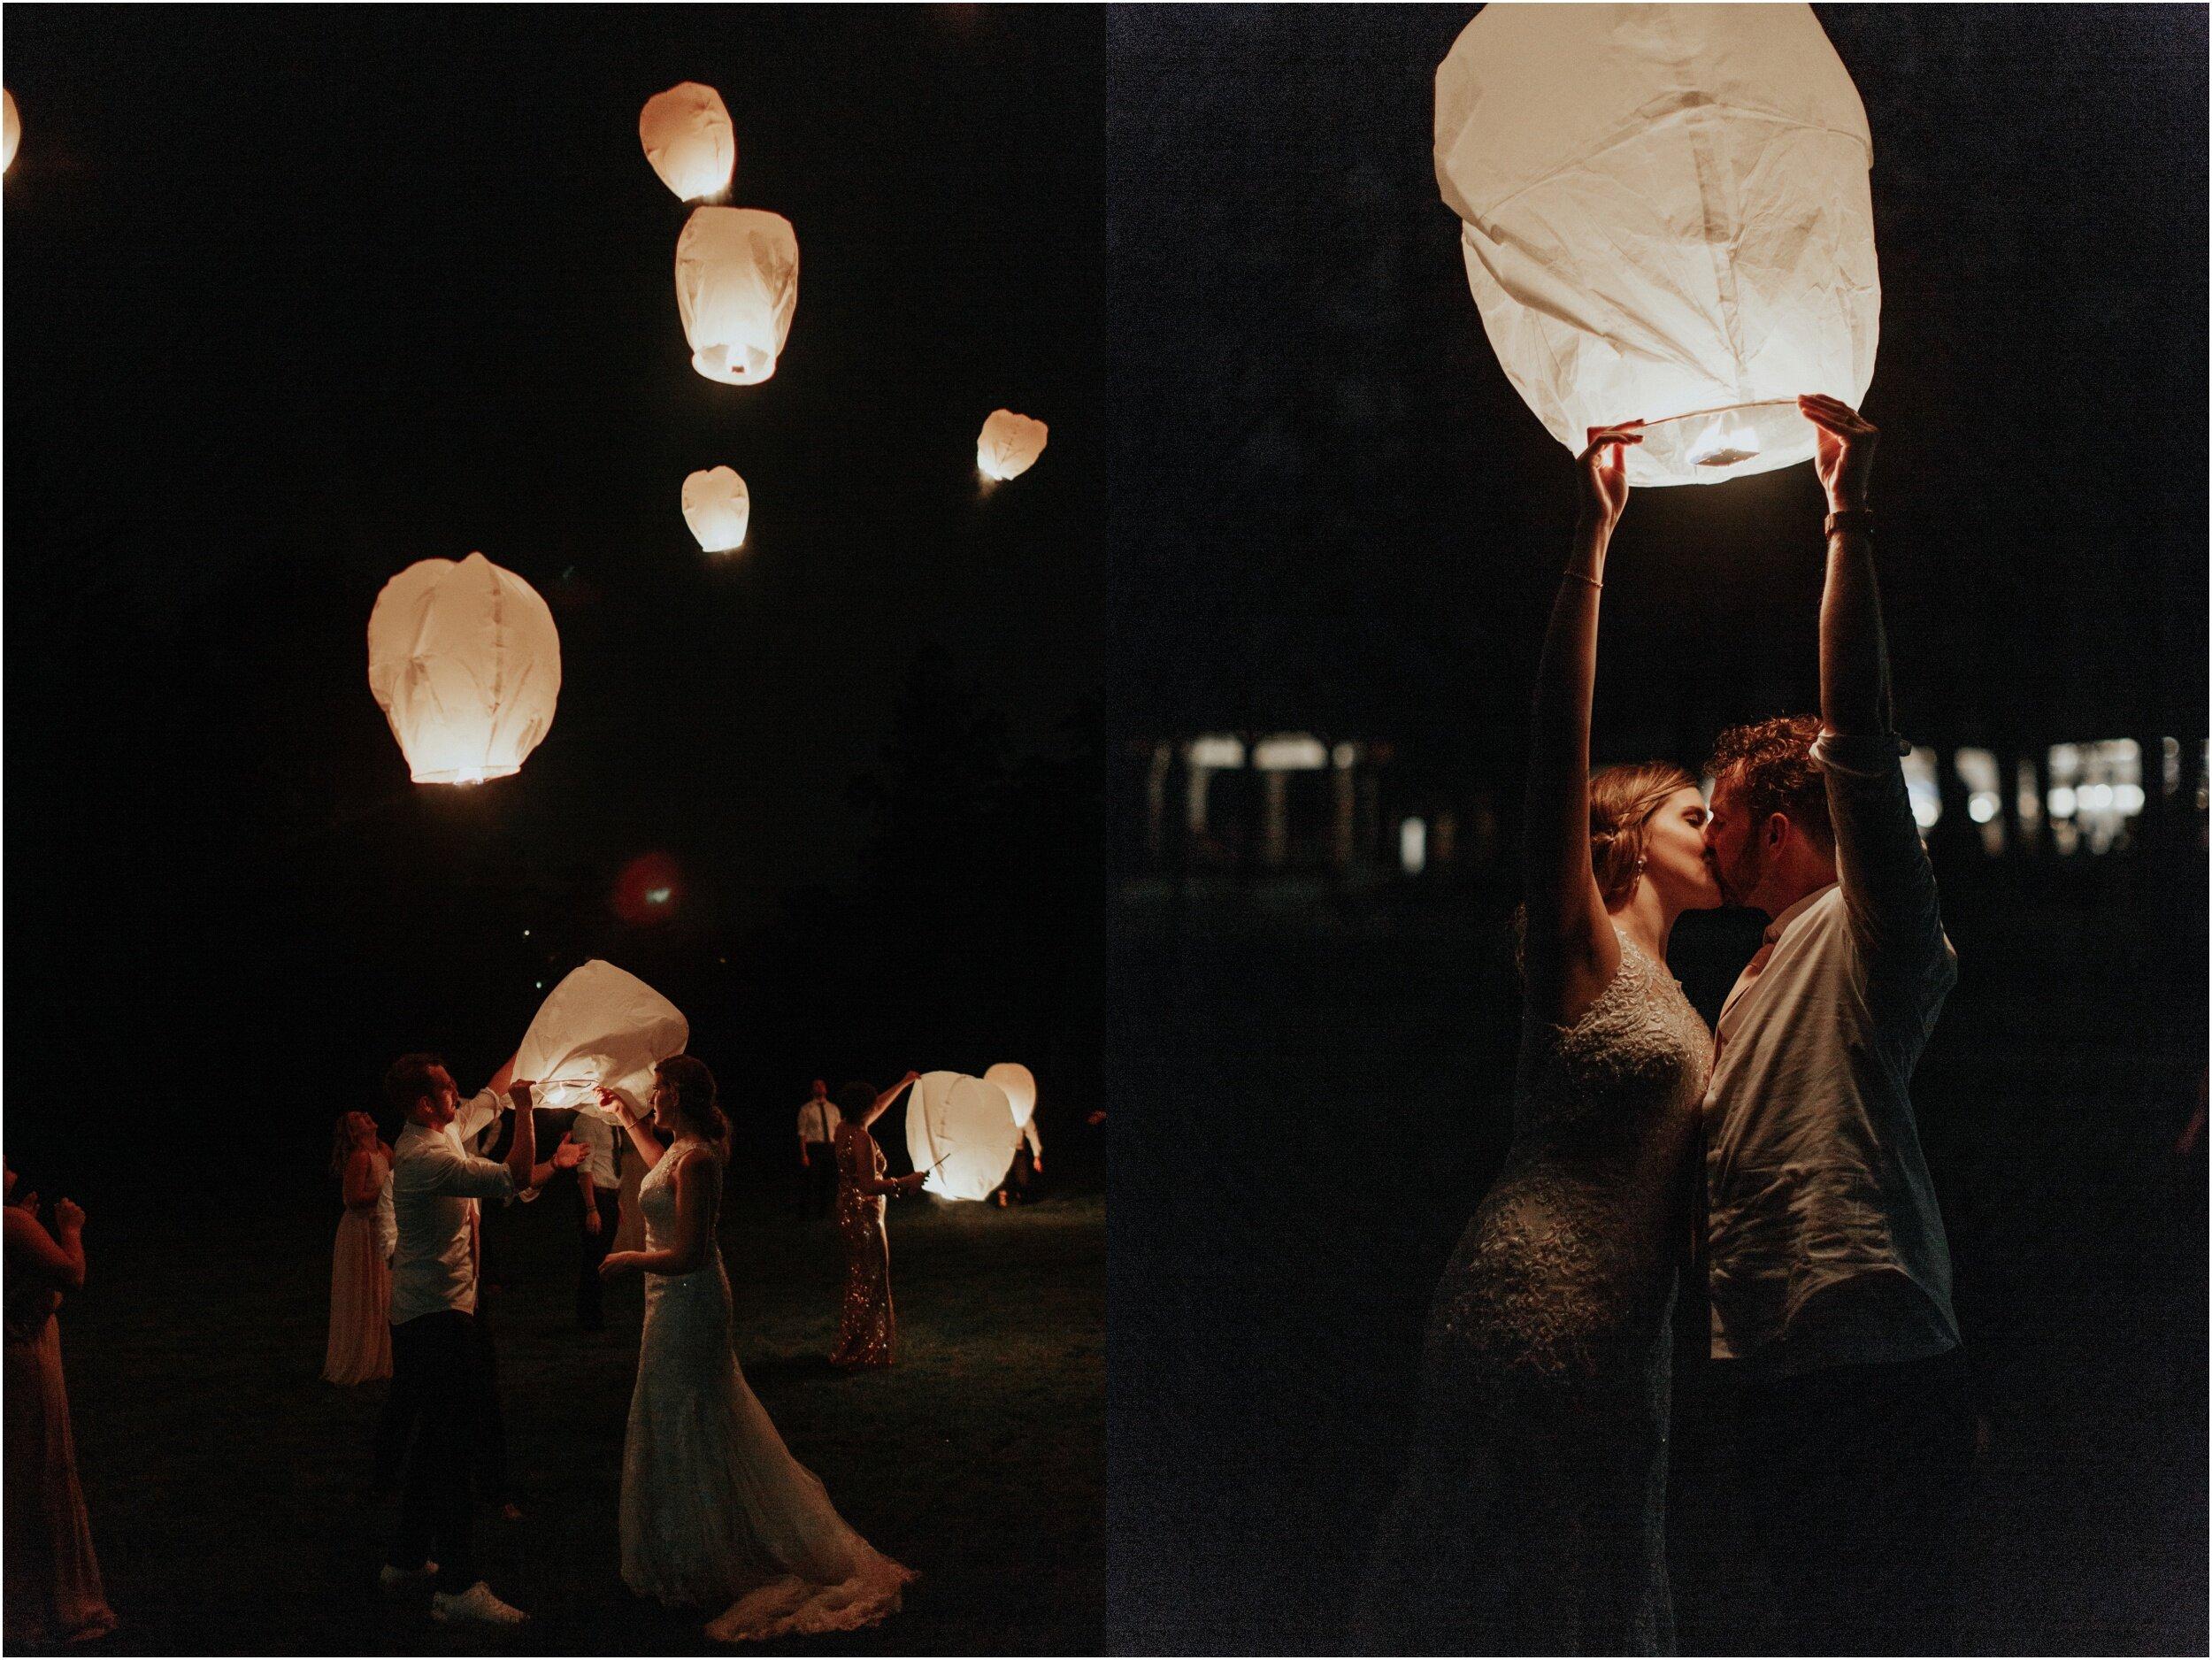 steph-and-jordan-cox-our-wedding-historic-shady-lane-compass-wedding-collective-hazel-lining-photography-destination-elopement-wedding-engagement-photography_0107.jpg